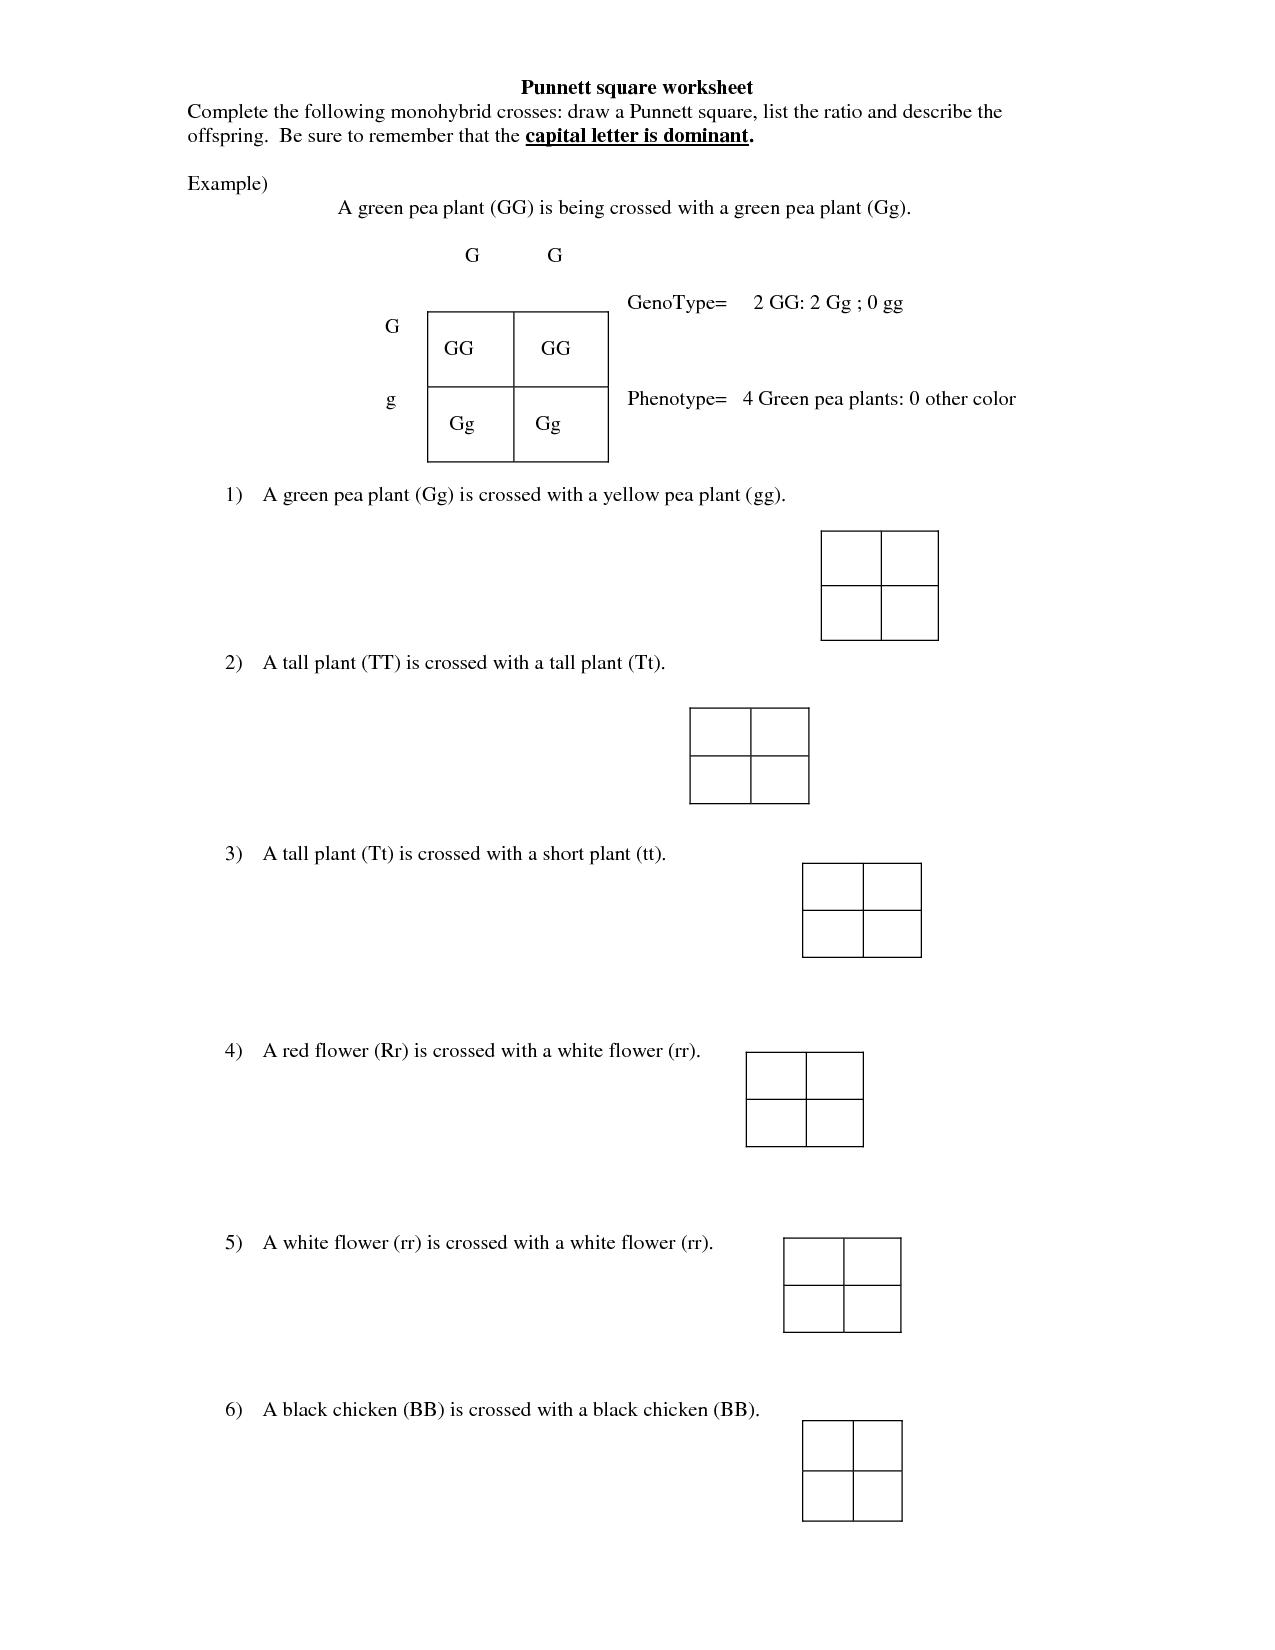 14 Best Images of Monohybrid Cross Worksheet Answer Key